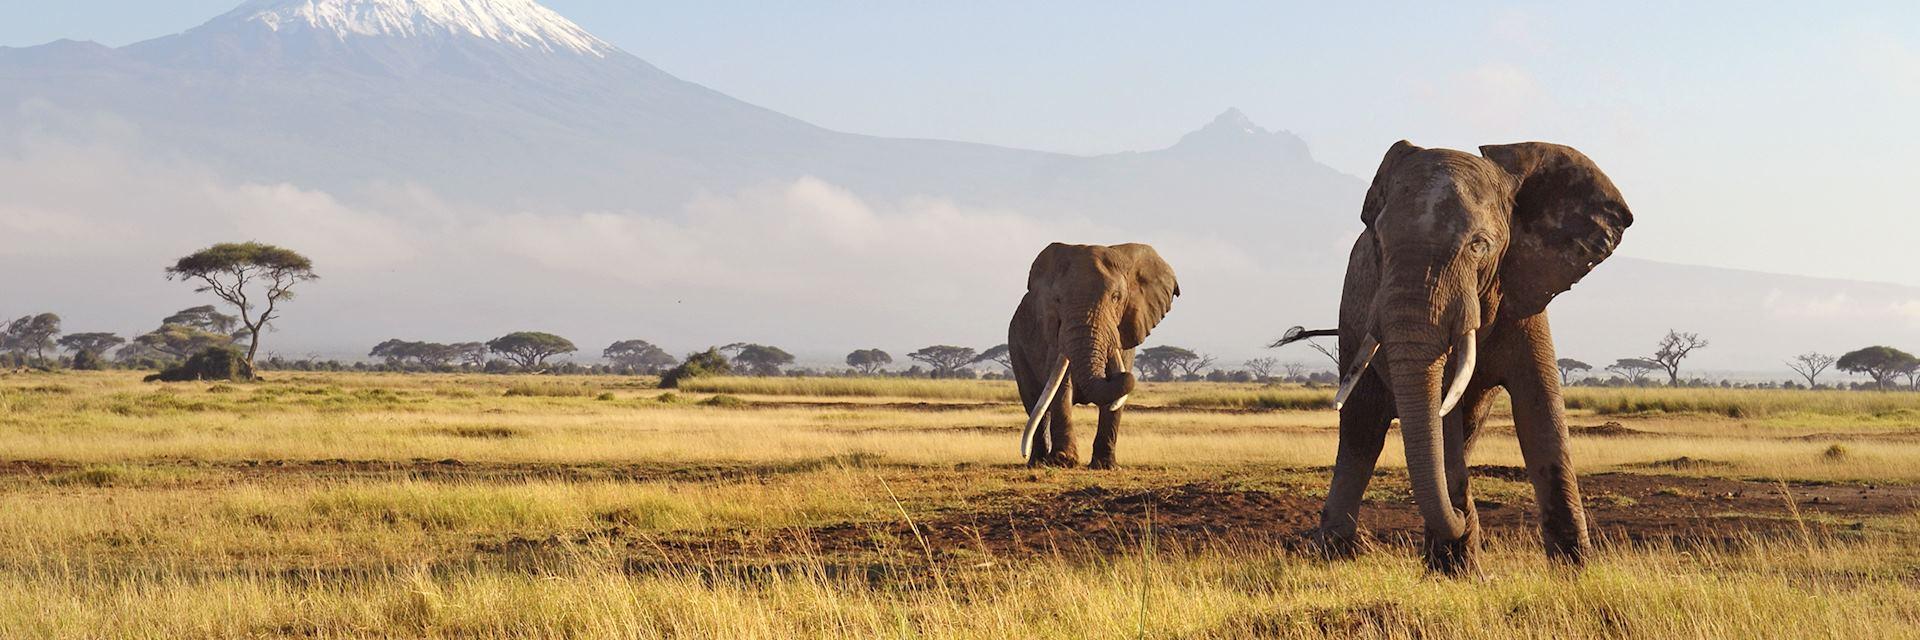 Elephants in the African savanna